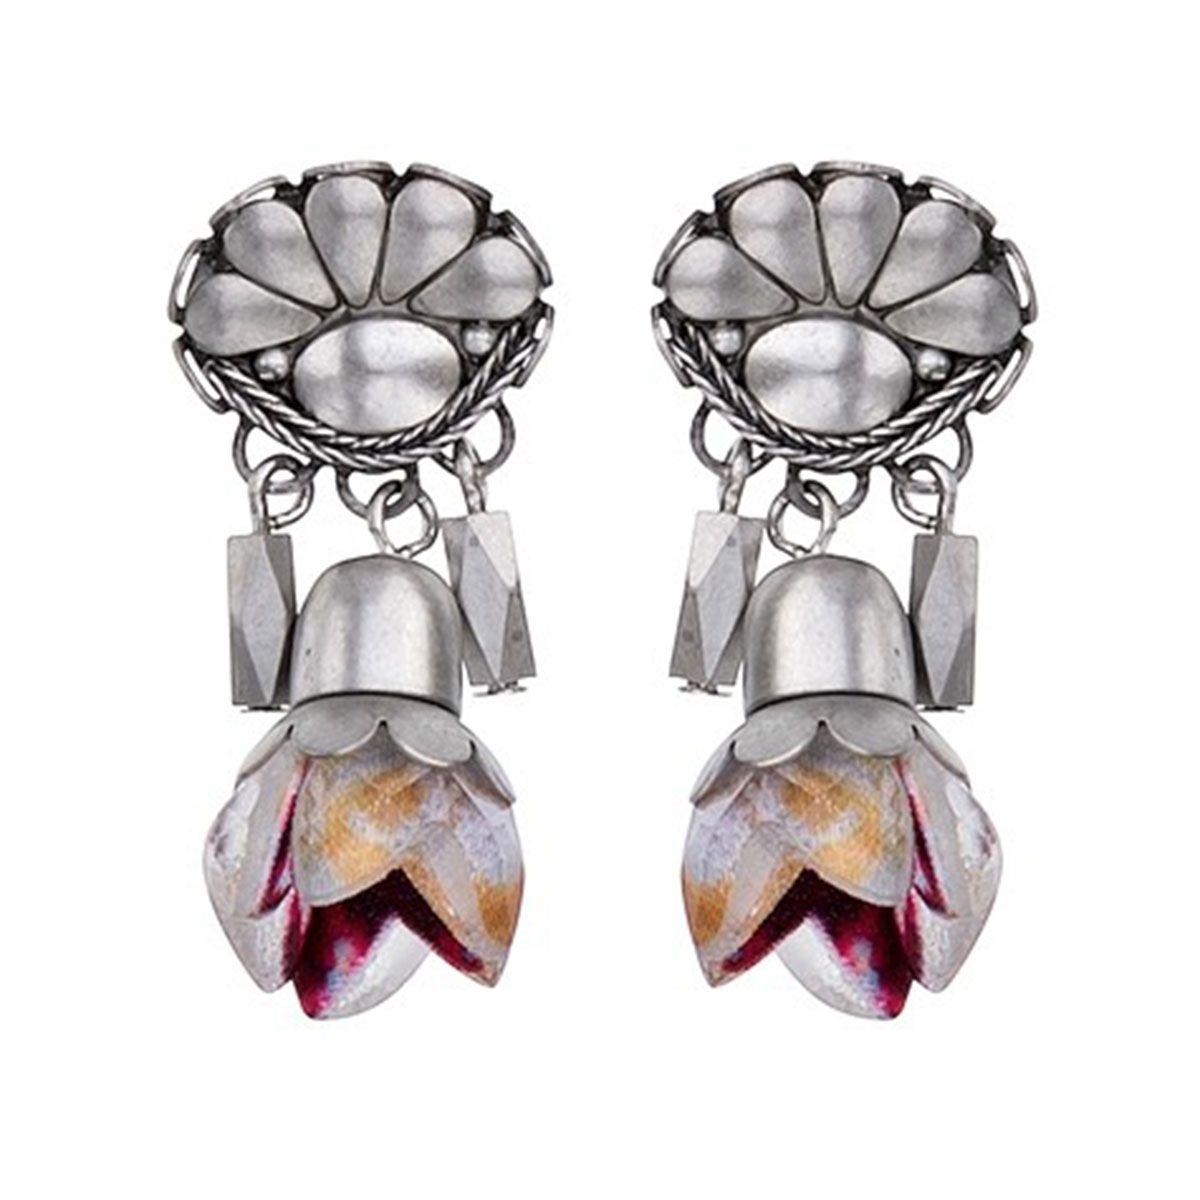 Ayala Bar Israeli Jewelry - Transcendent Devotion Nadine Post Earrings -  Fall/Winter 2018